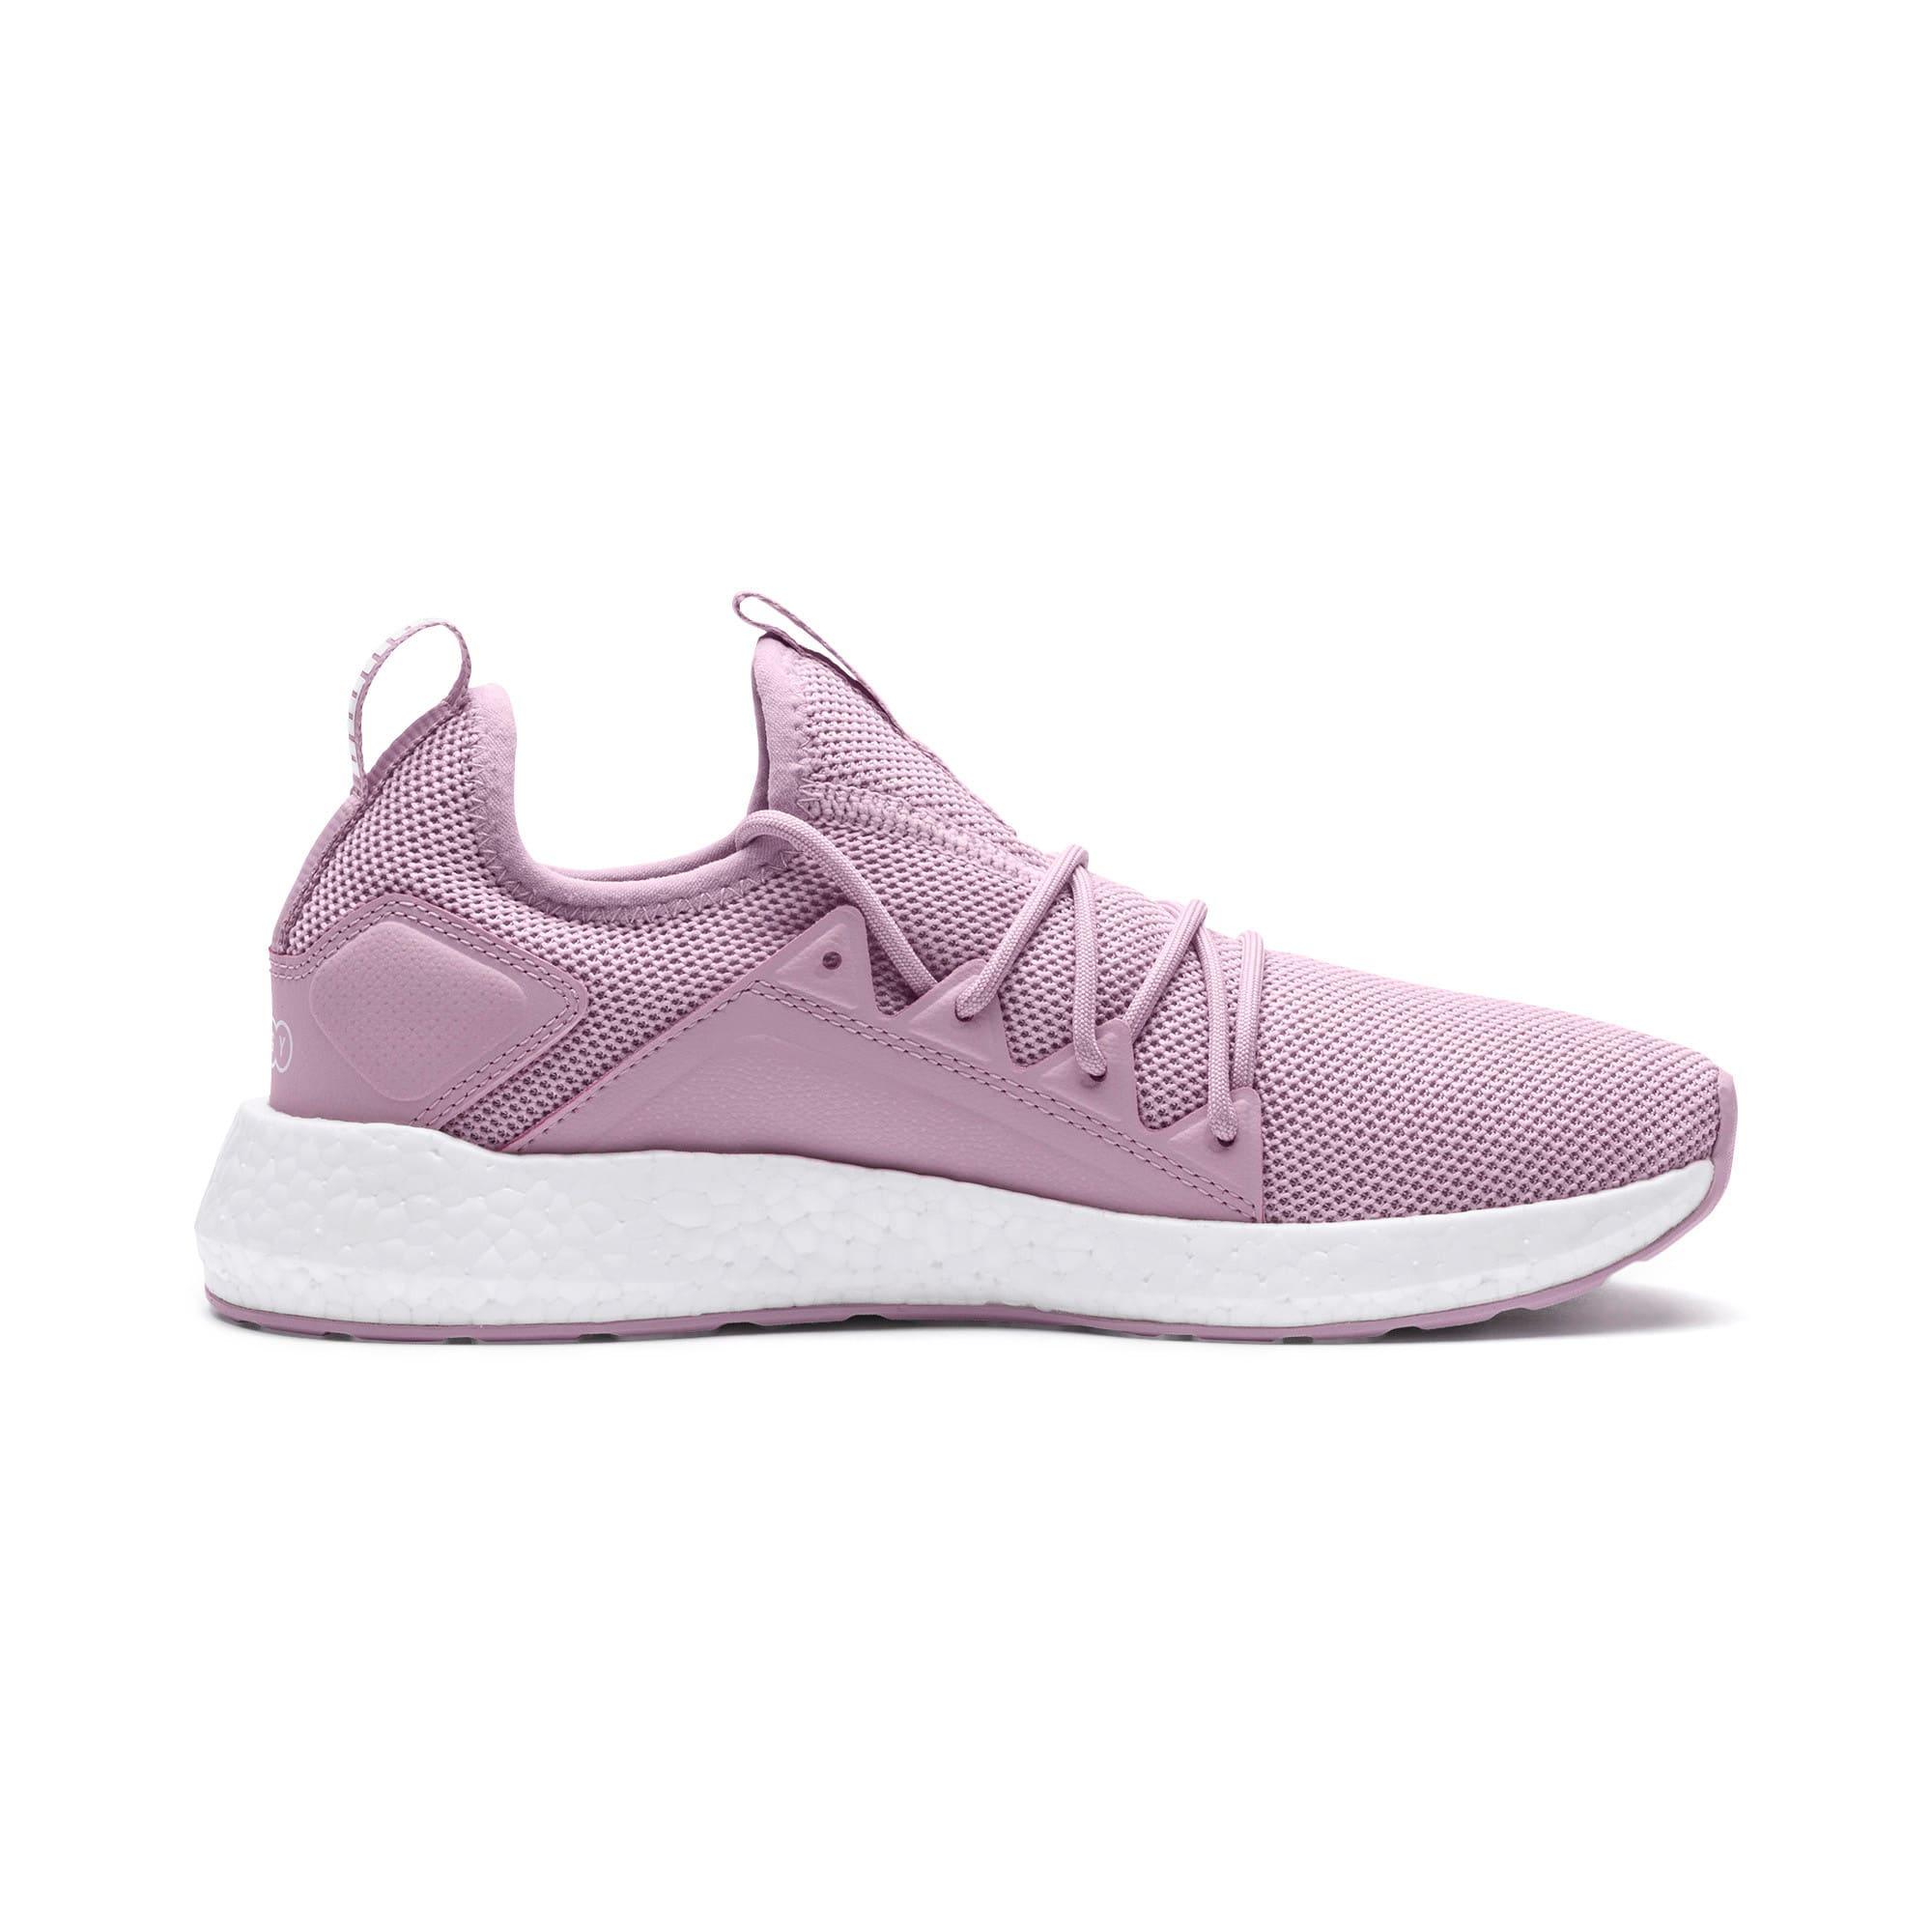 Thumbnail 5 of NRGY Neko Women's Running Shoes, Winsome Orchid-Puma White, medium